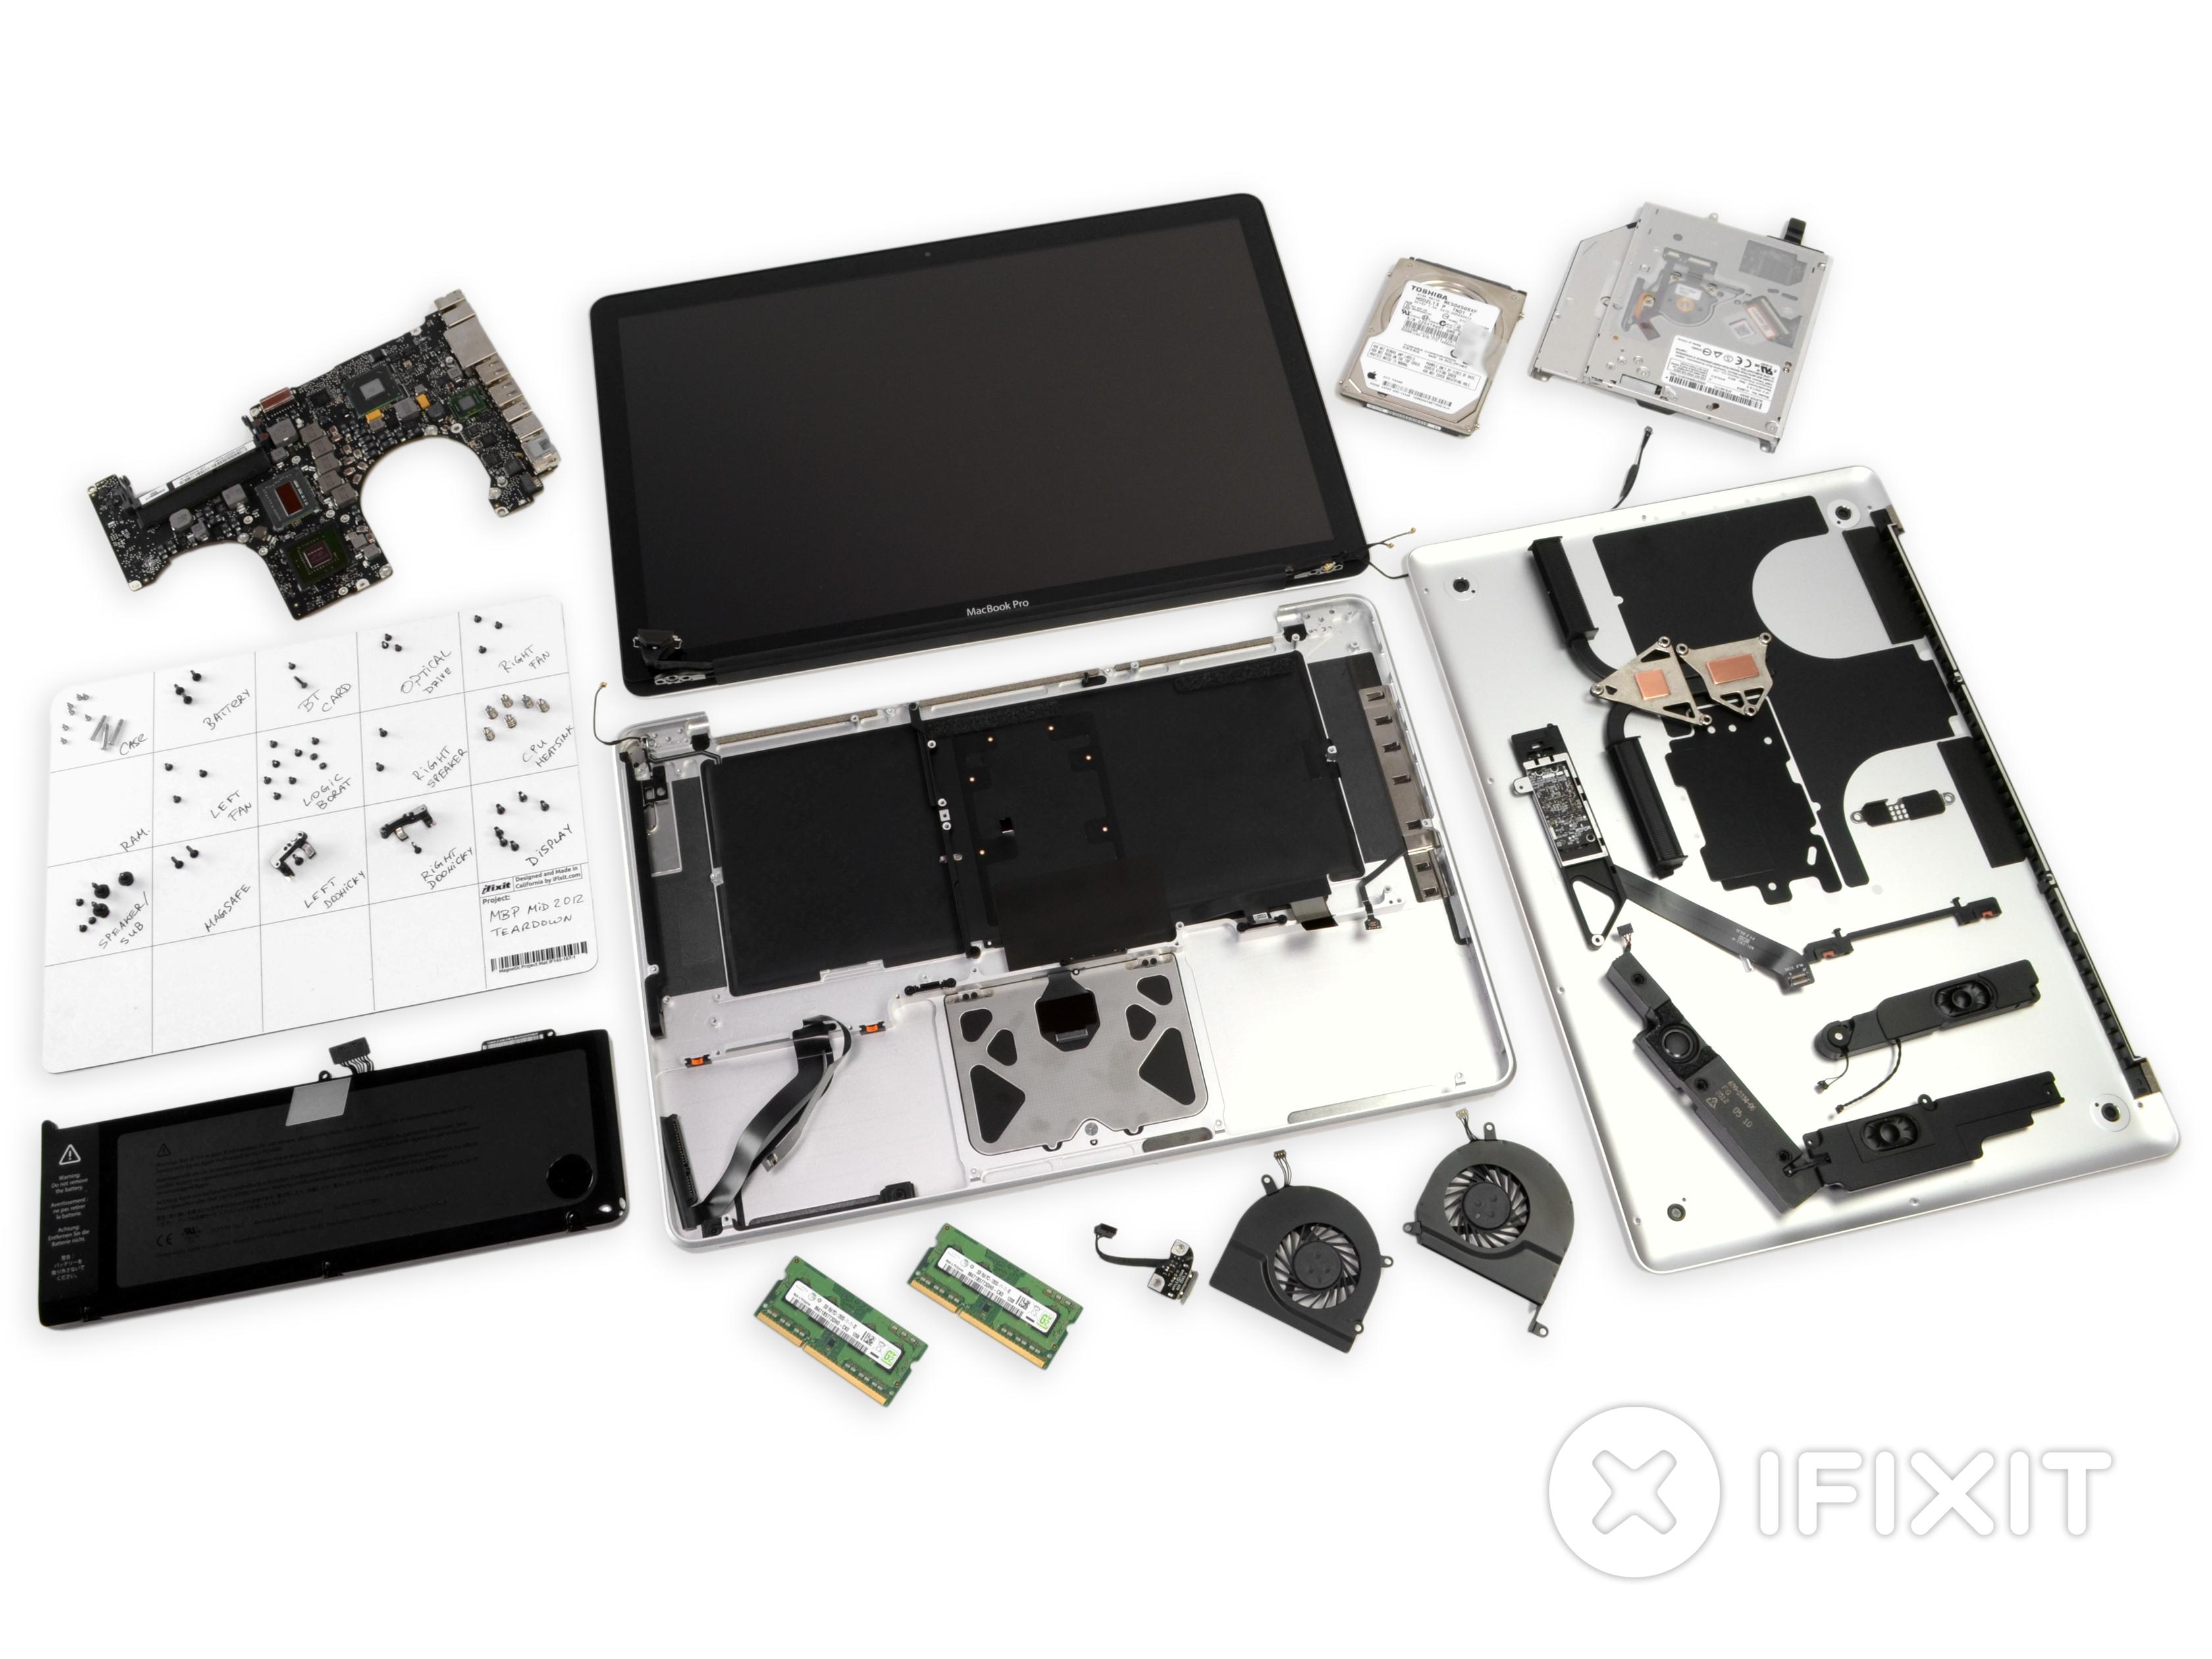 macbook pro 15 unibody mid 2012 teardown ifixit rh ifixit com MacBook Pro Mid-2012 Ports MacBook Pro 15 Mid-2012